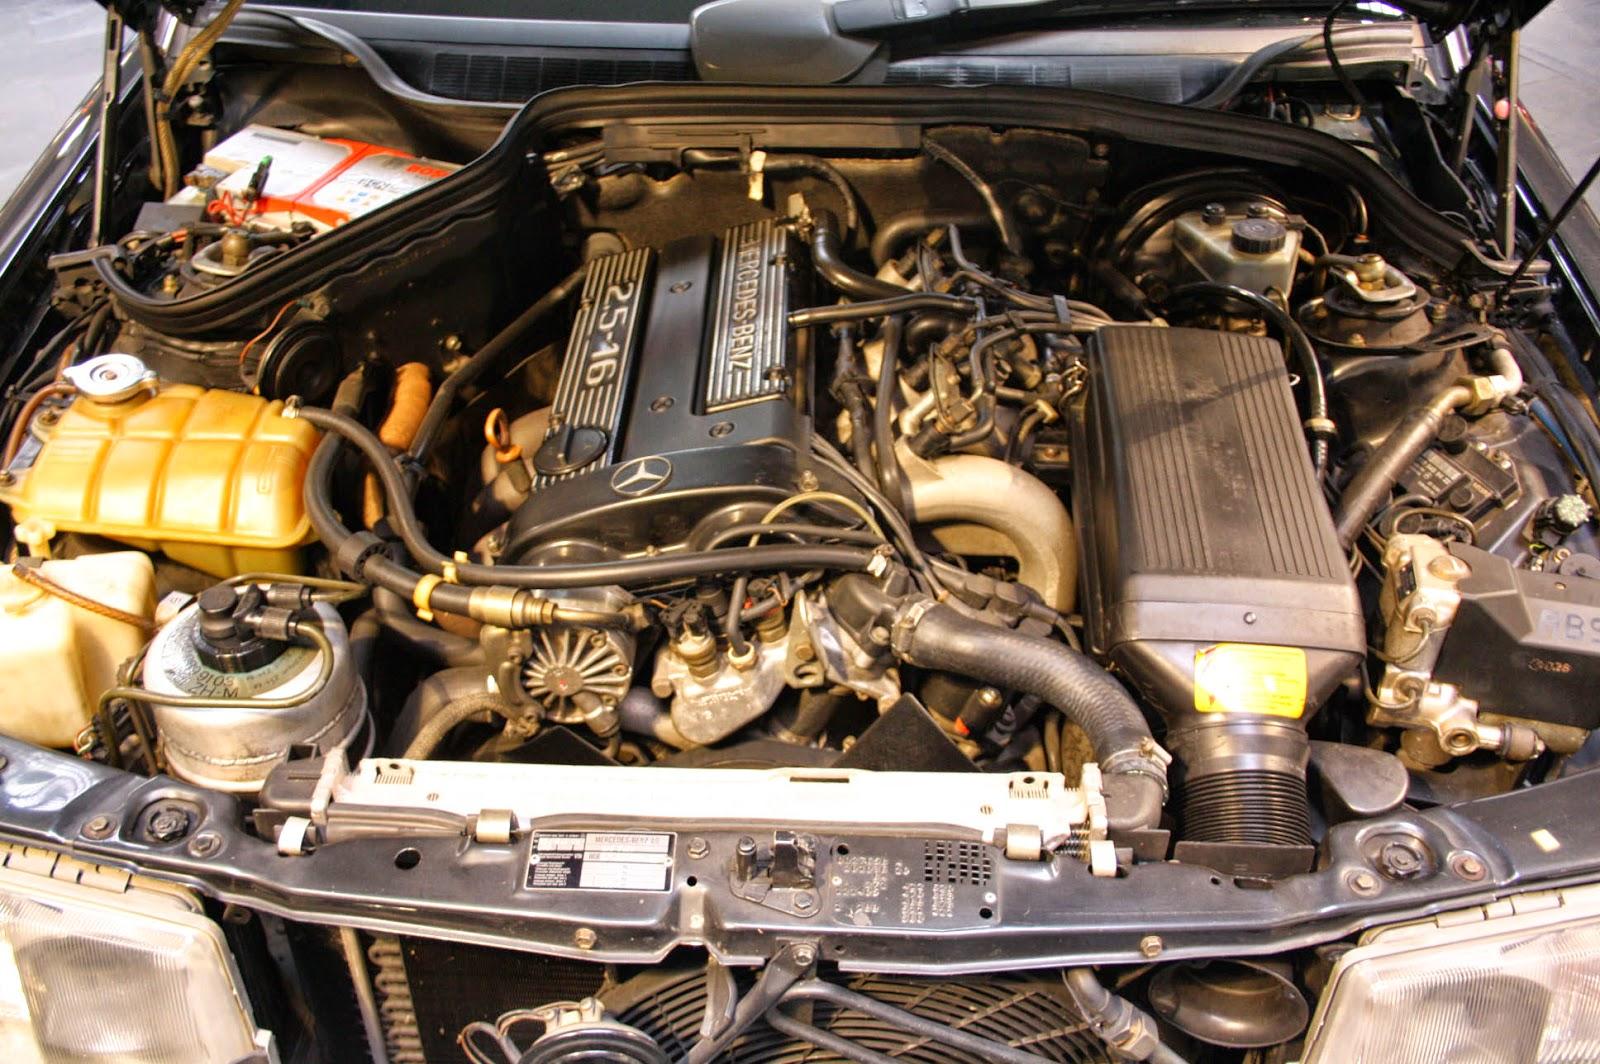 Mercedes benz w201 190e 2 5 16 evolution ii benztuning for Mercedes benz engineering